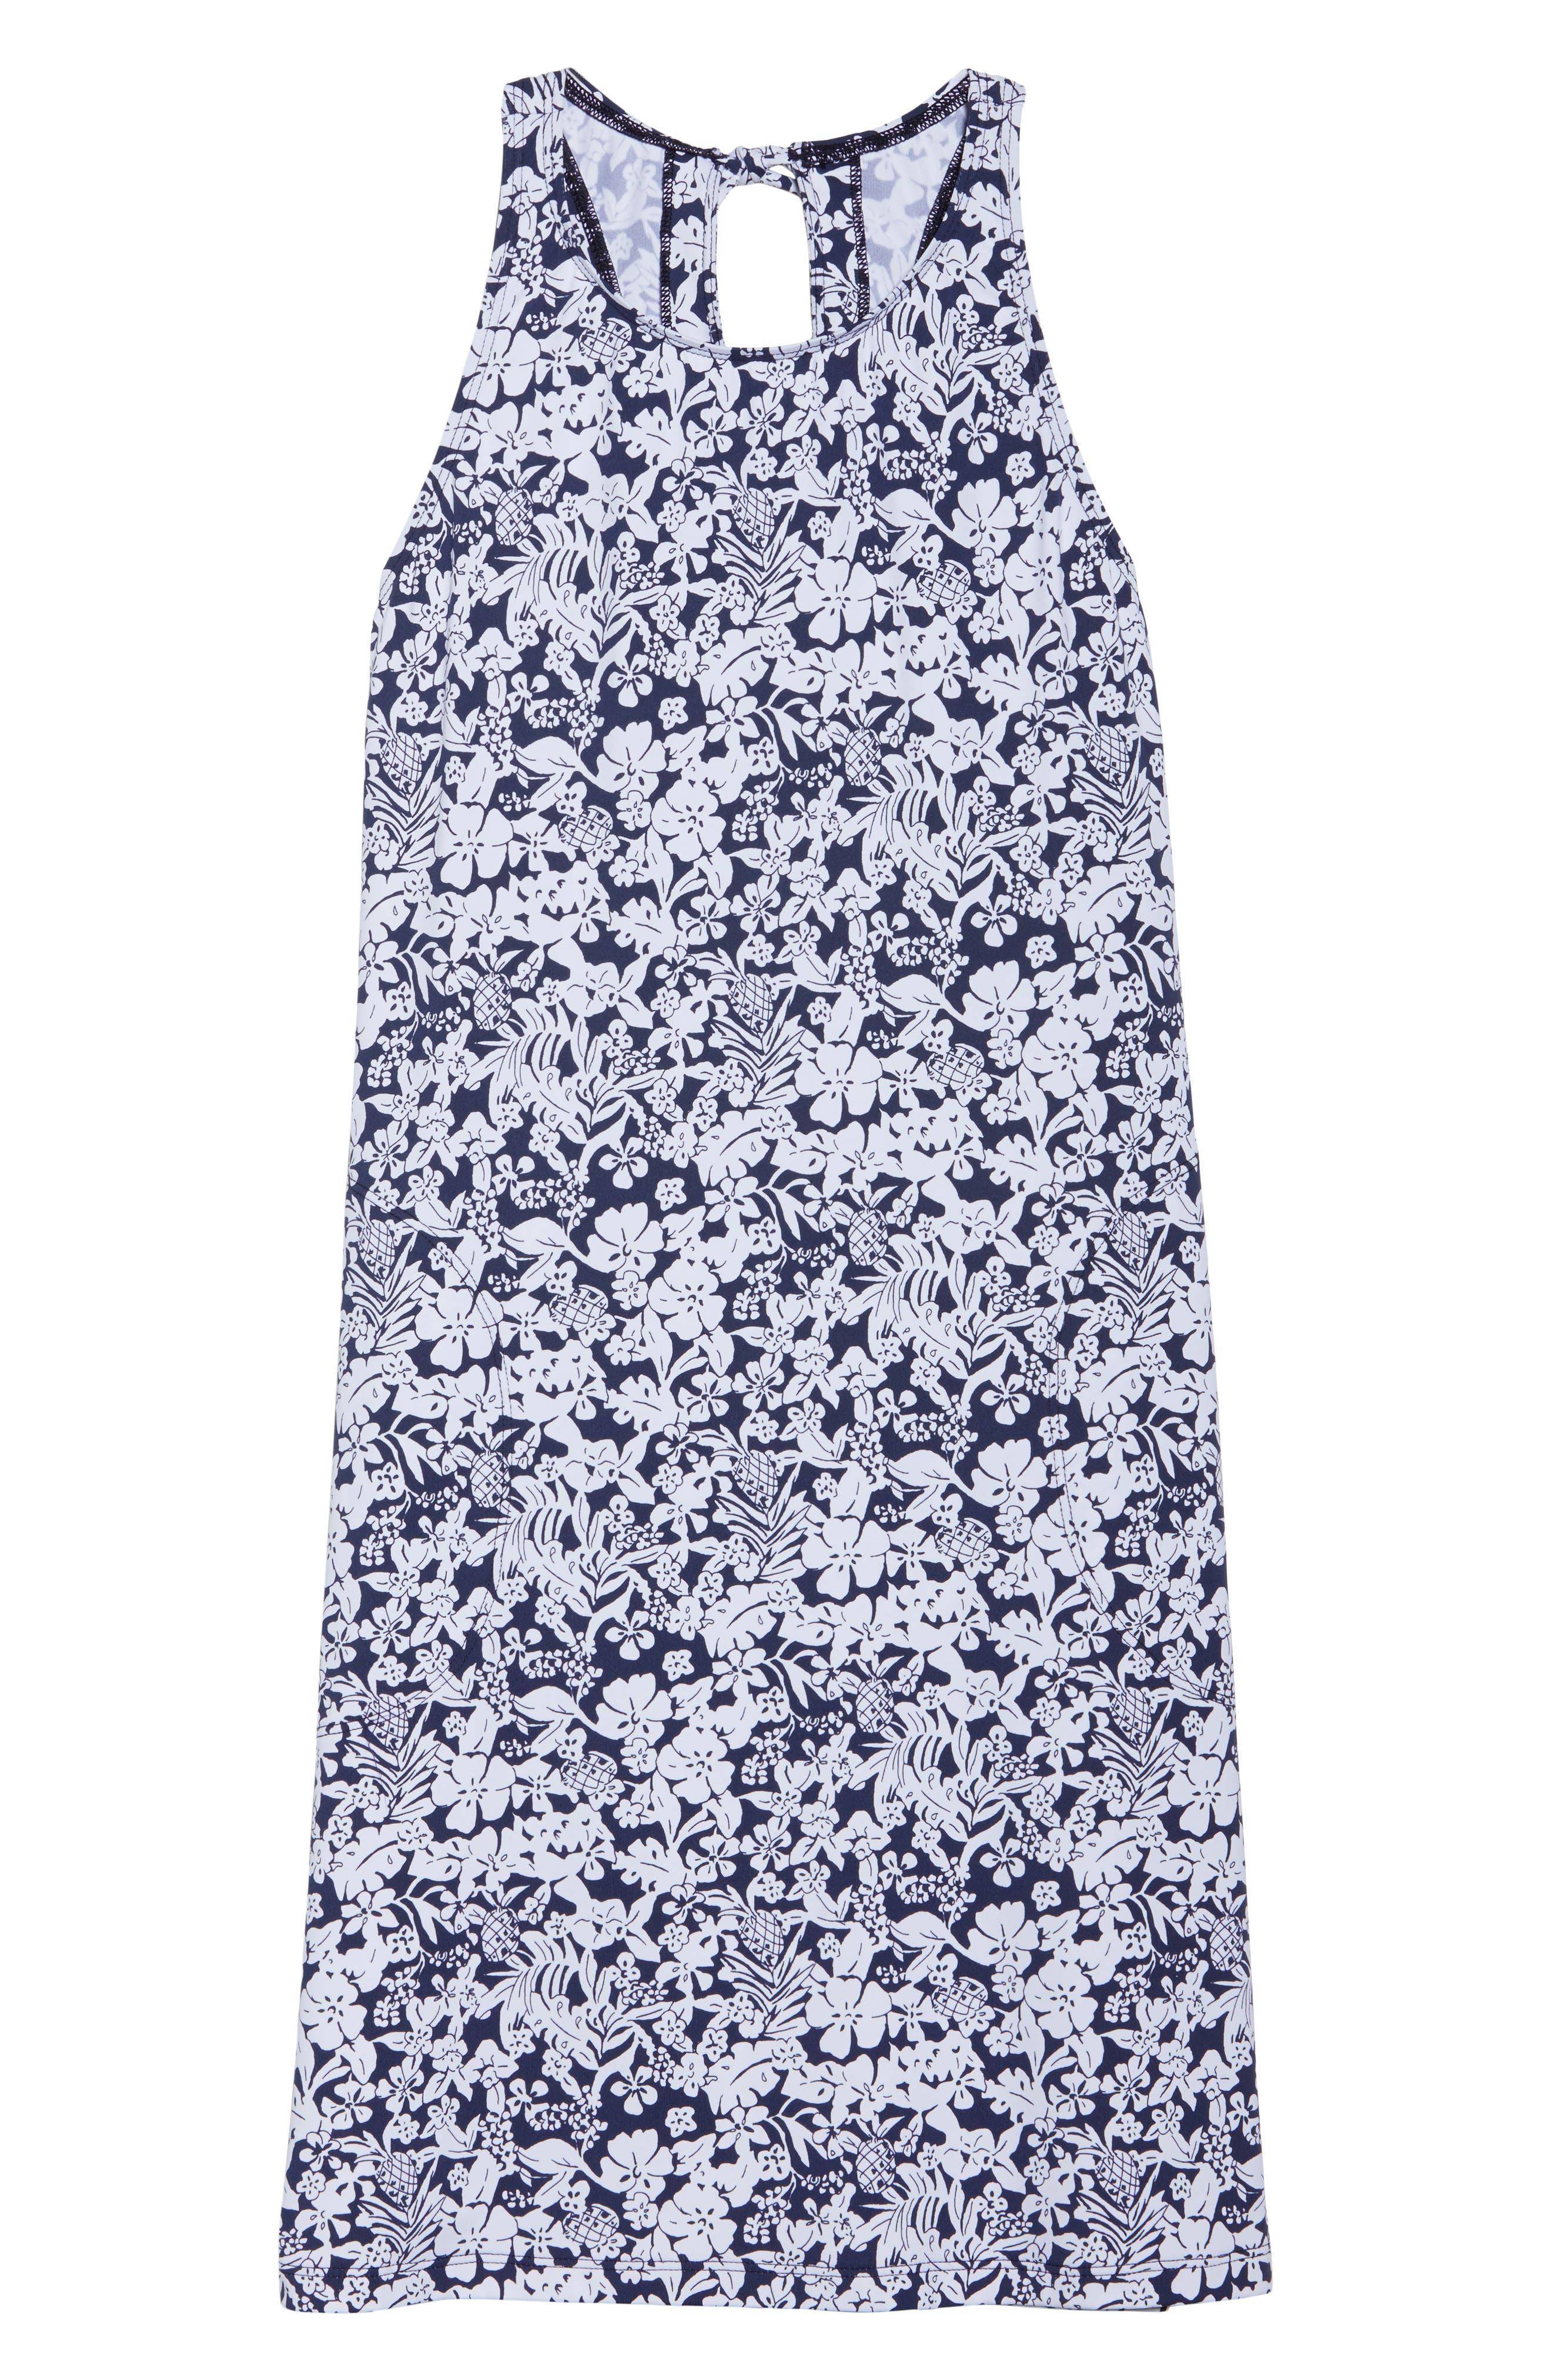 Riviera Tiles Cover-Up Dress,                             Alternate thumbnail 6, color,                             400